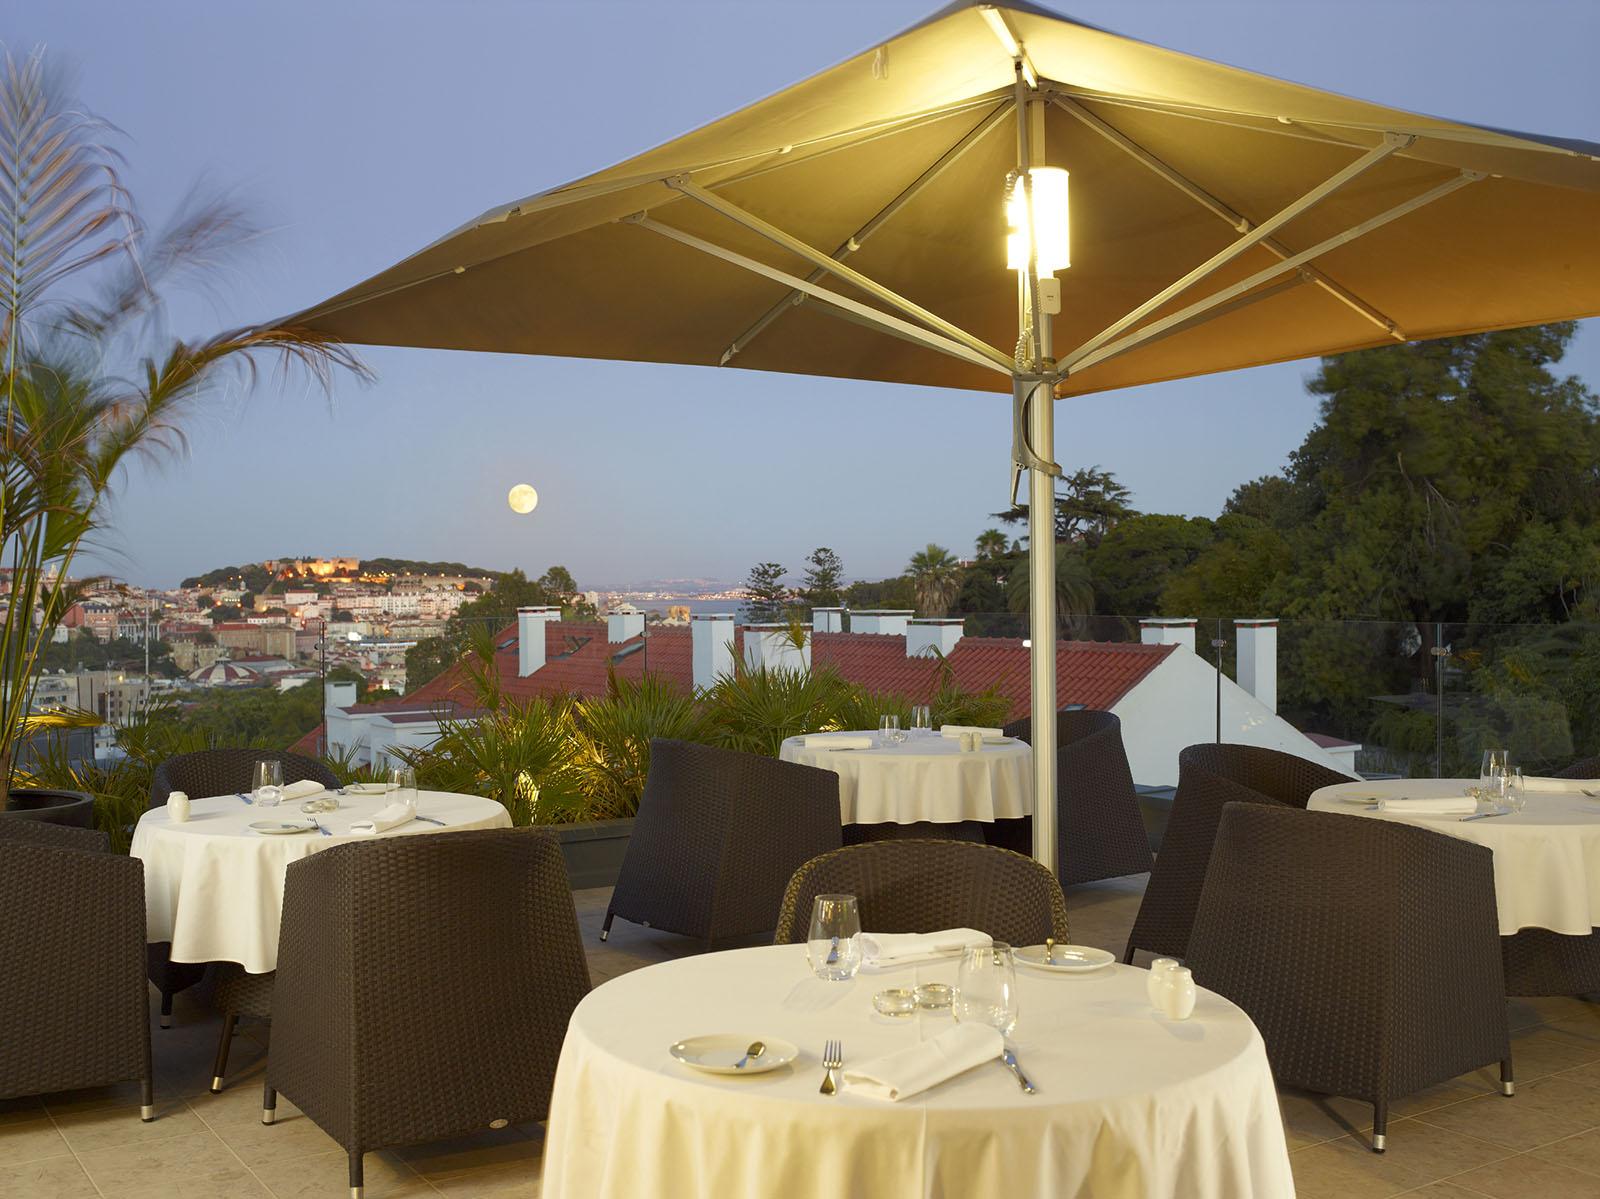 Rooftop palco para Sunsets e refeições à La Carte